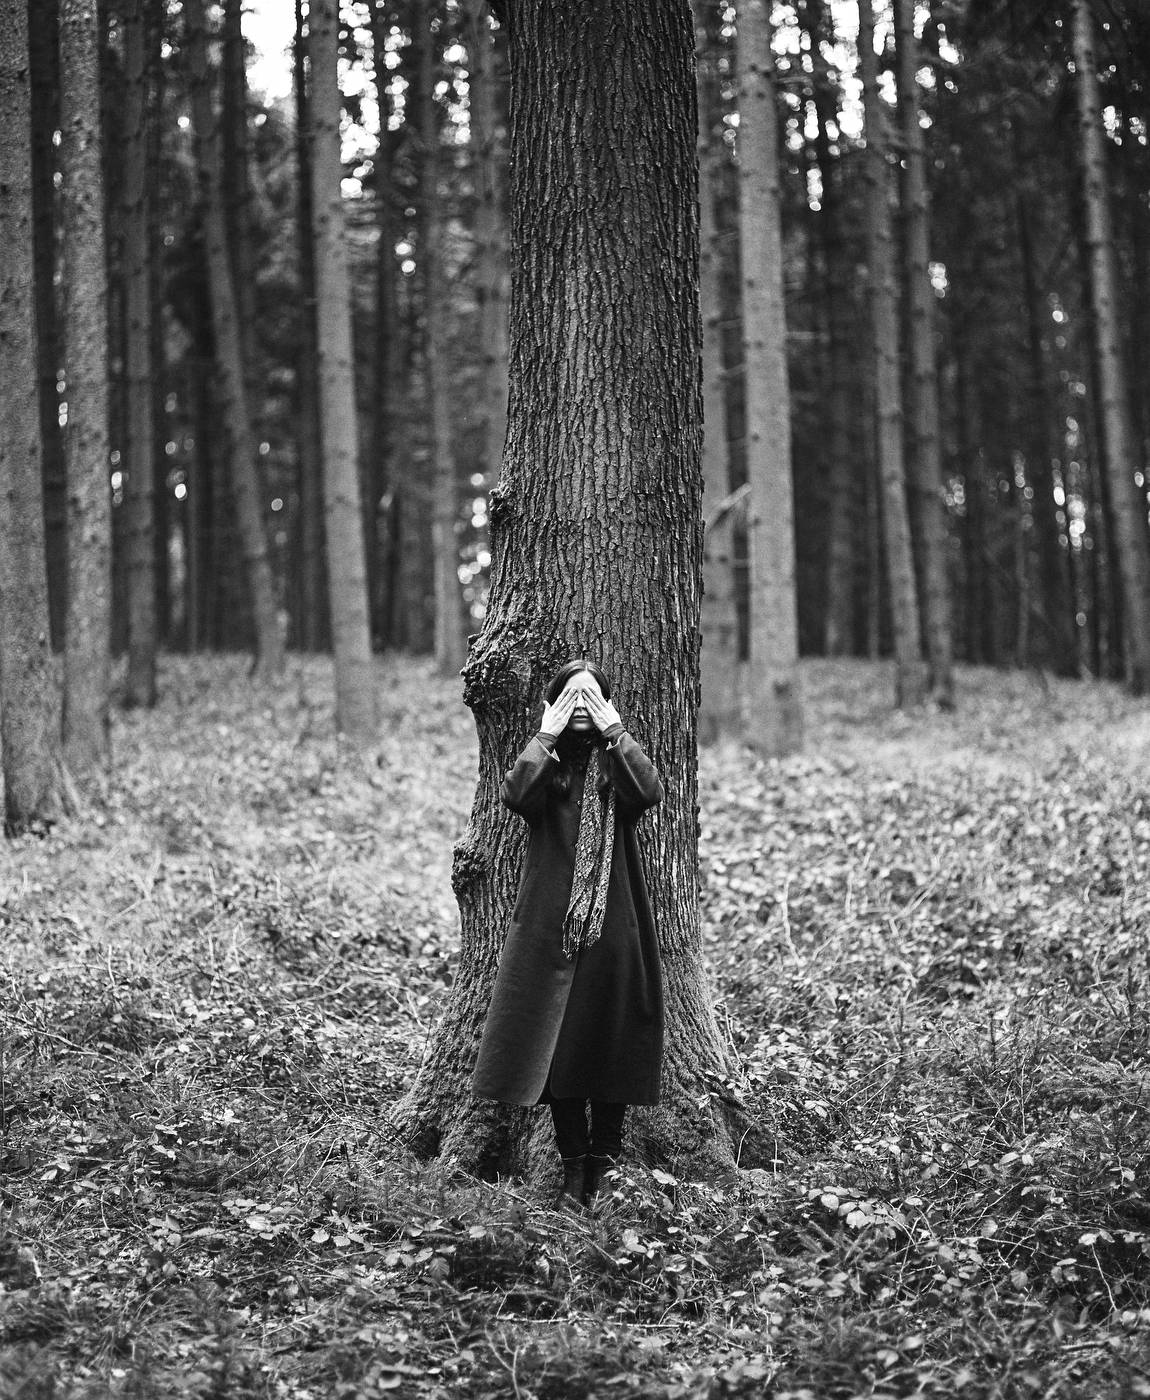 Alexander Urban Fotografie, Kodak TX400 6x7 - http://www.alexurban.de/